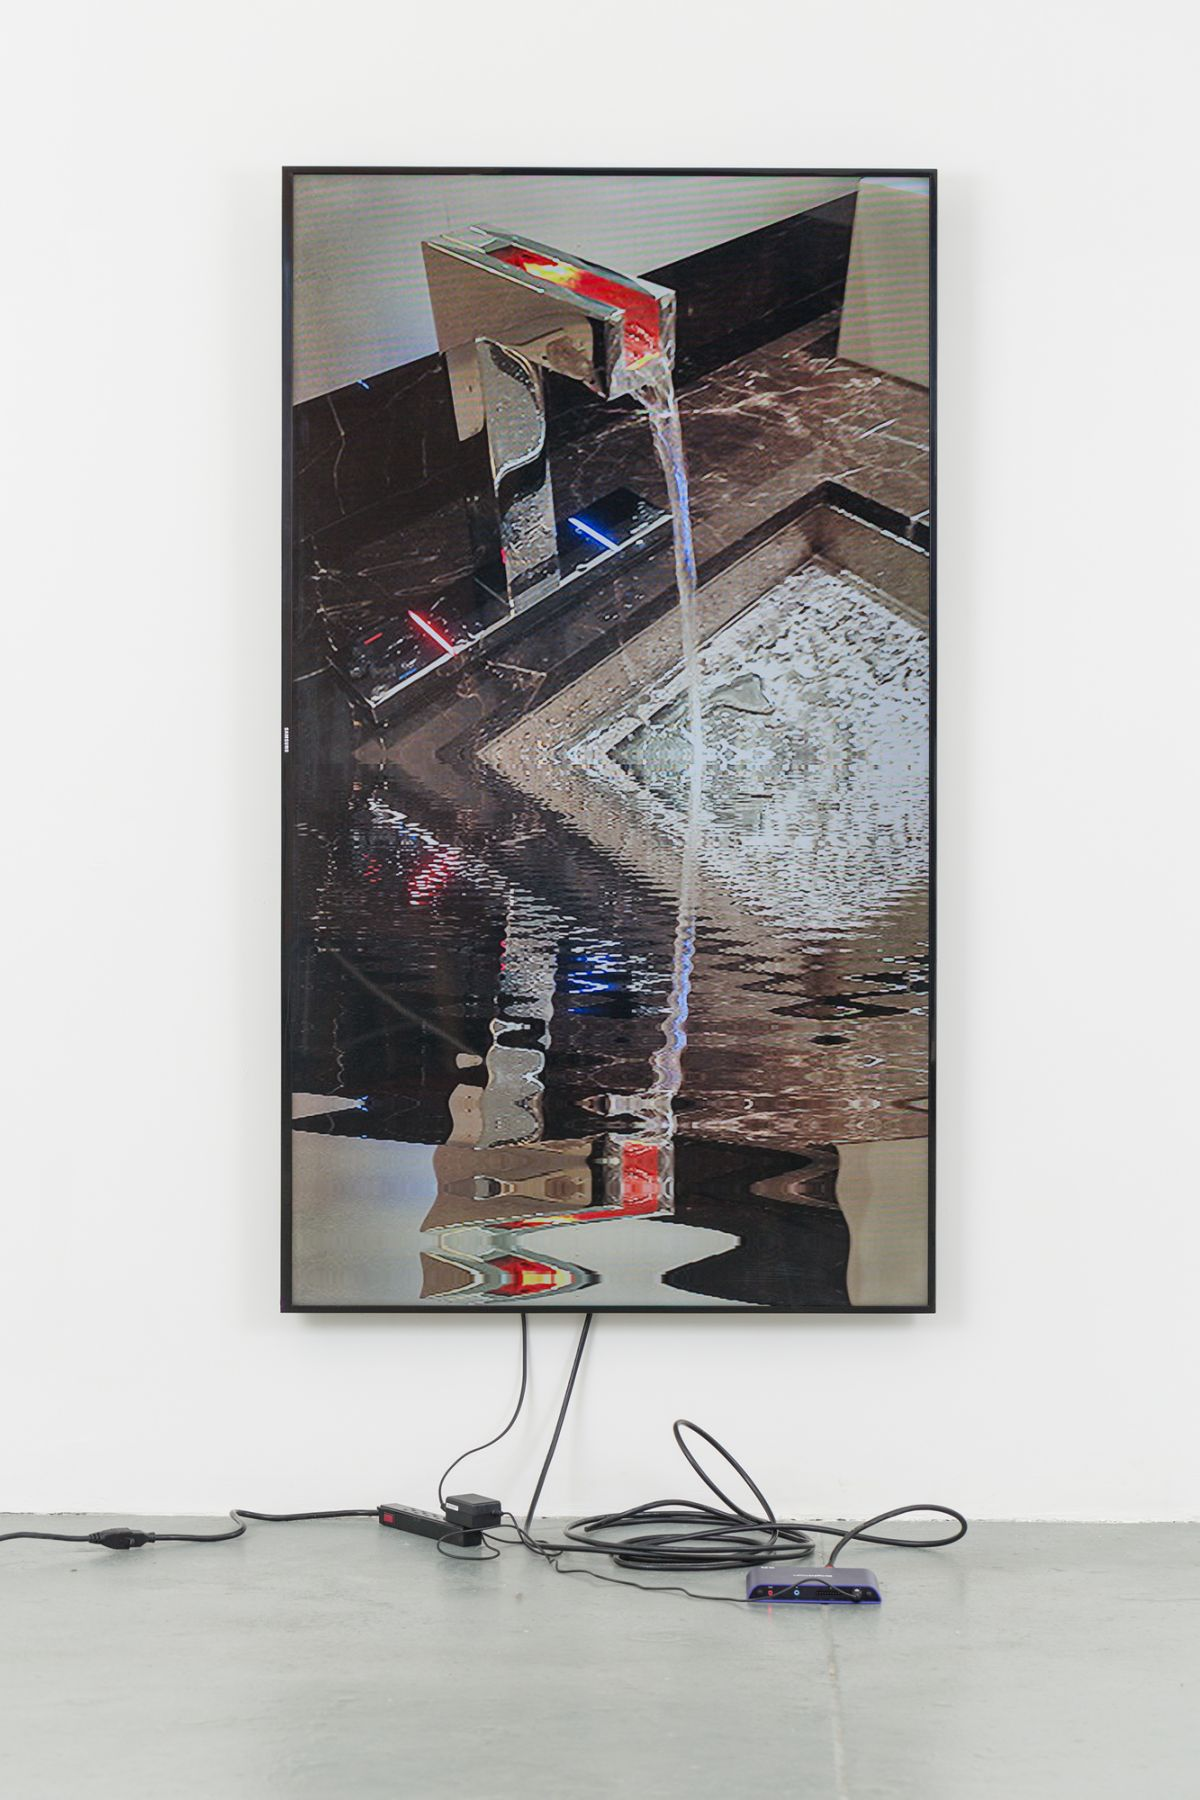 Cory Arcangel Boutique / Lakes, 2014.